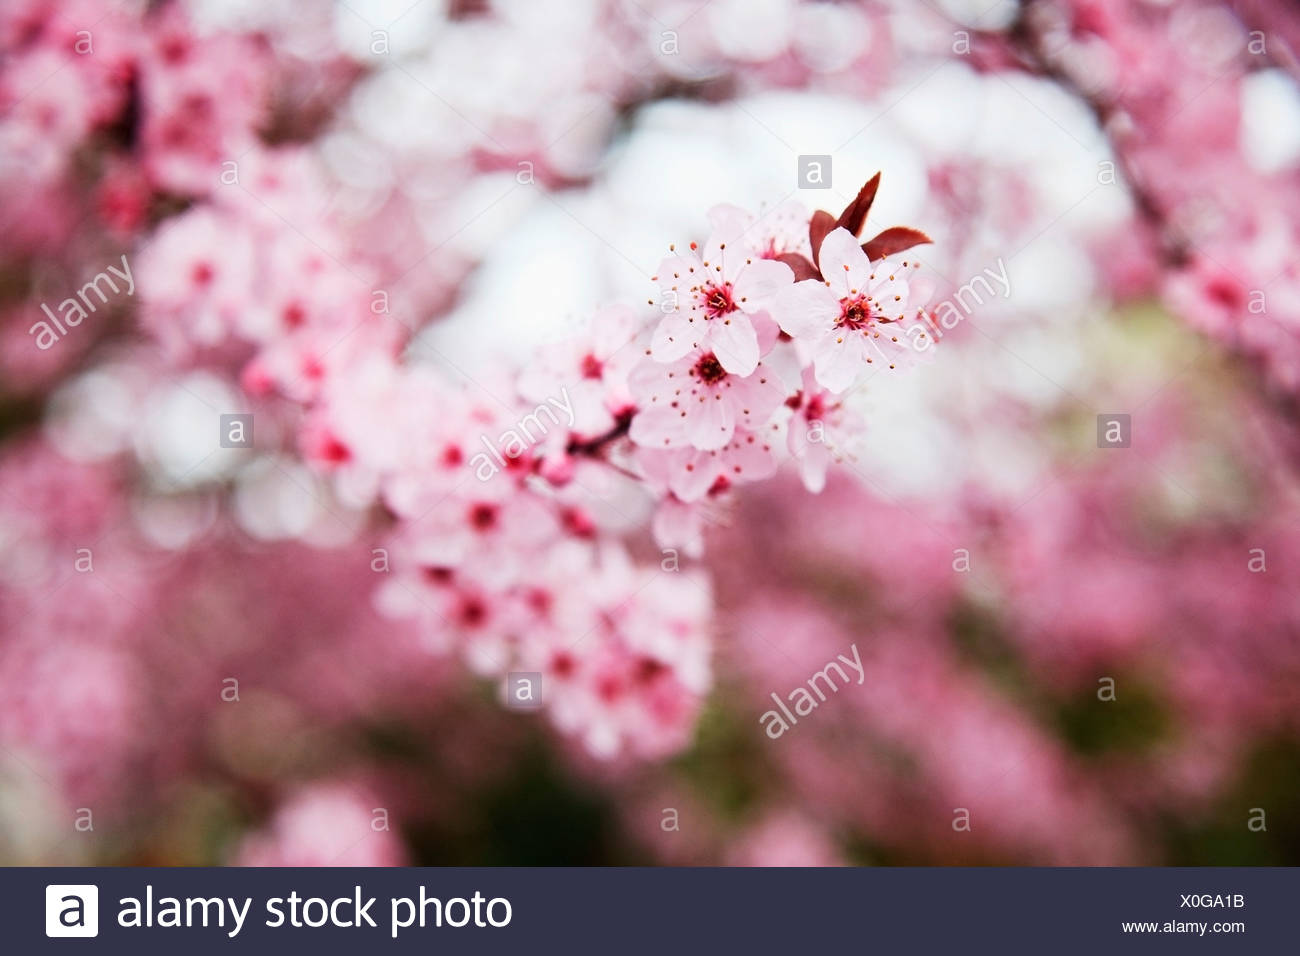 Portland oregon united states of america blossoms on the trees in portland oregon united states of america blossoms on the trees in spring in westmorland park mightylinksfo